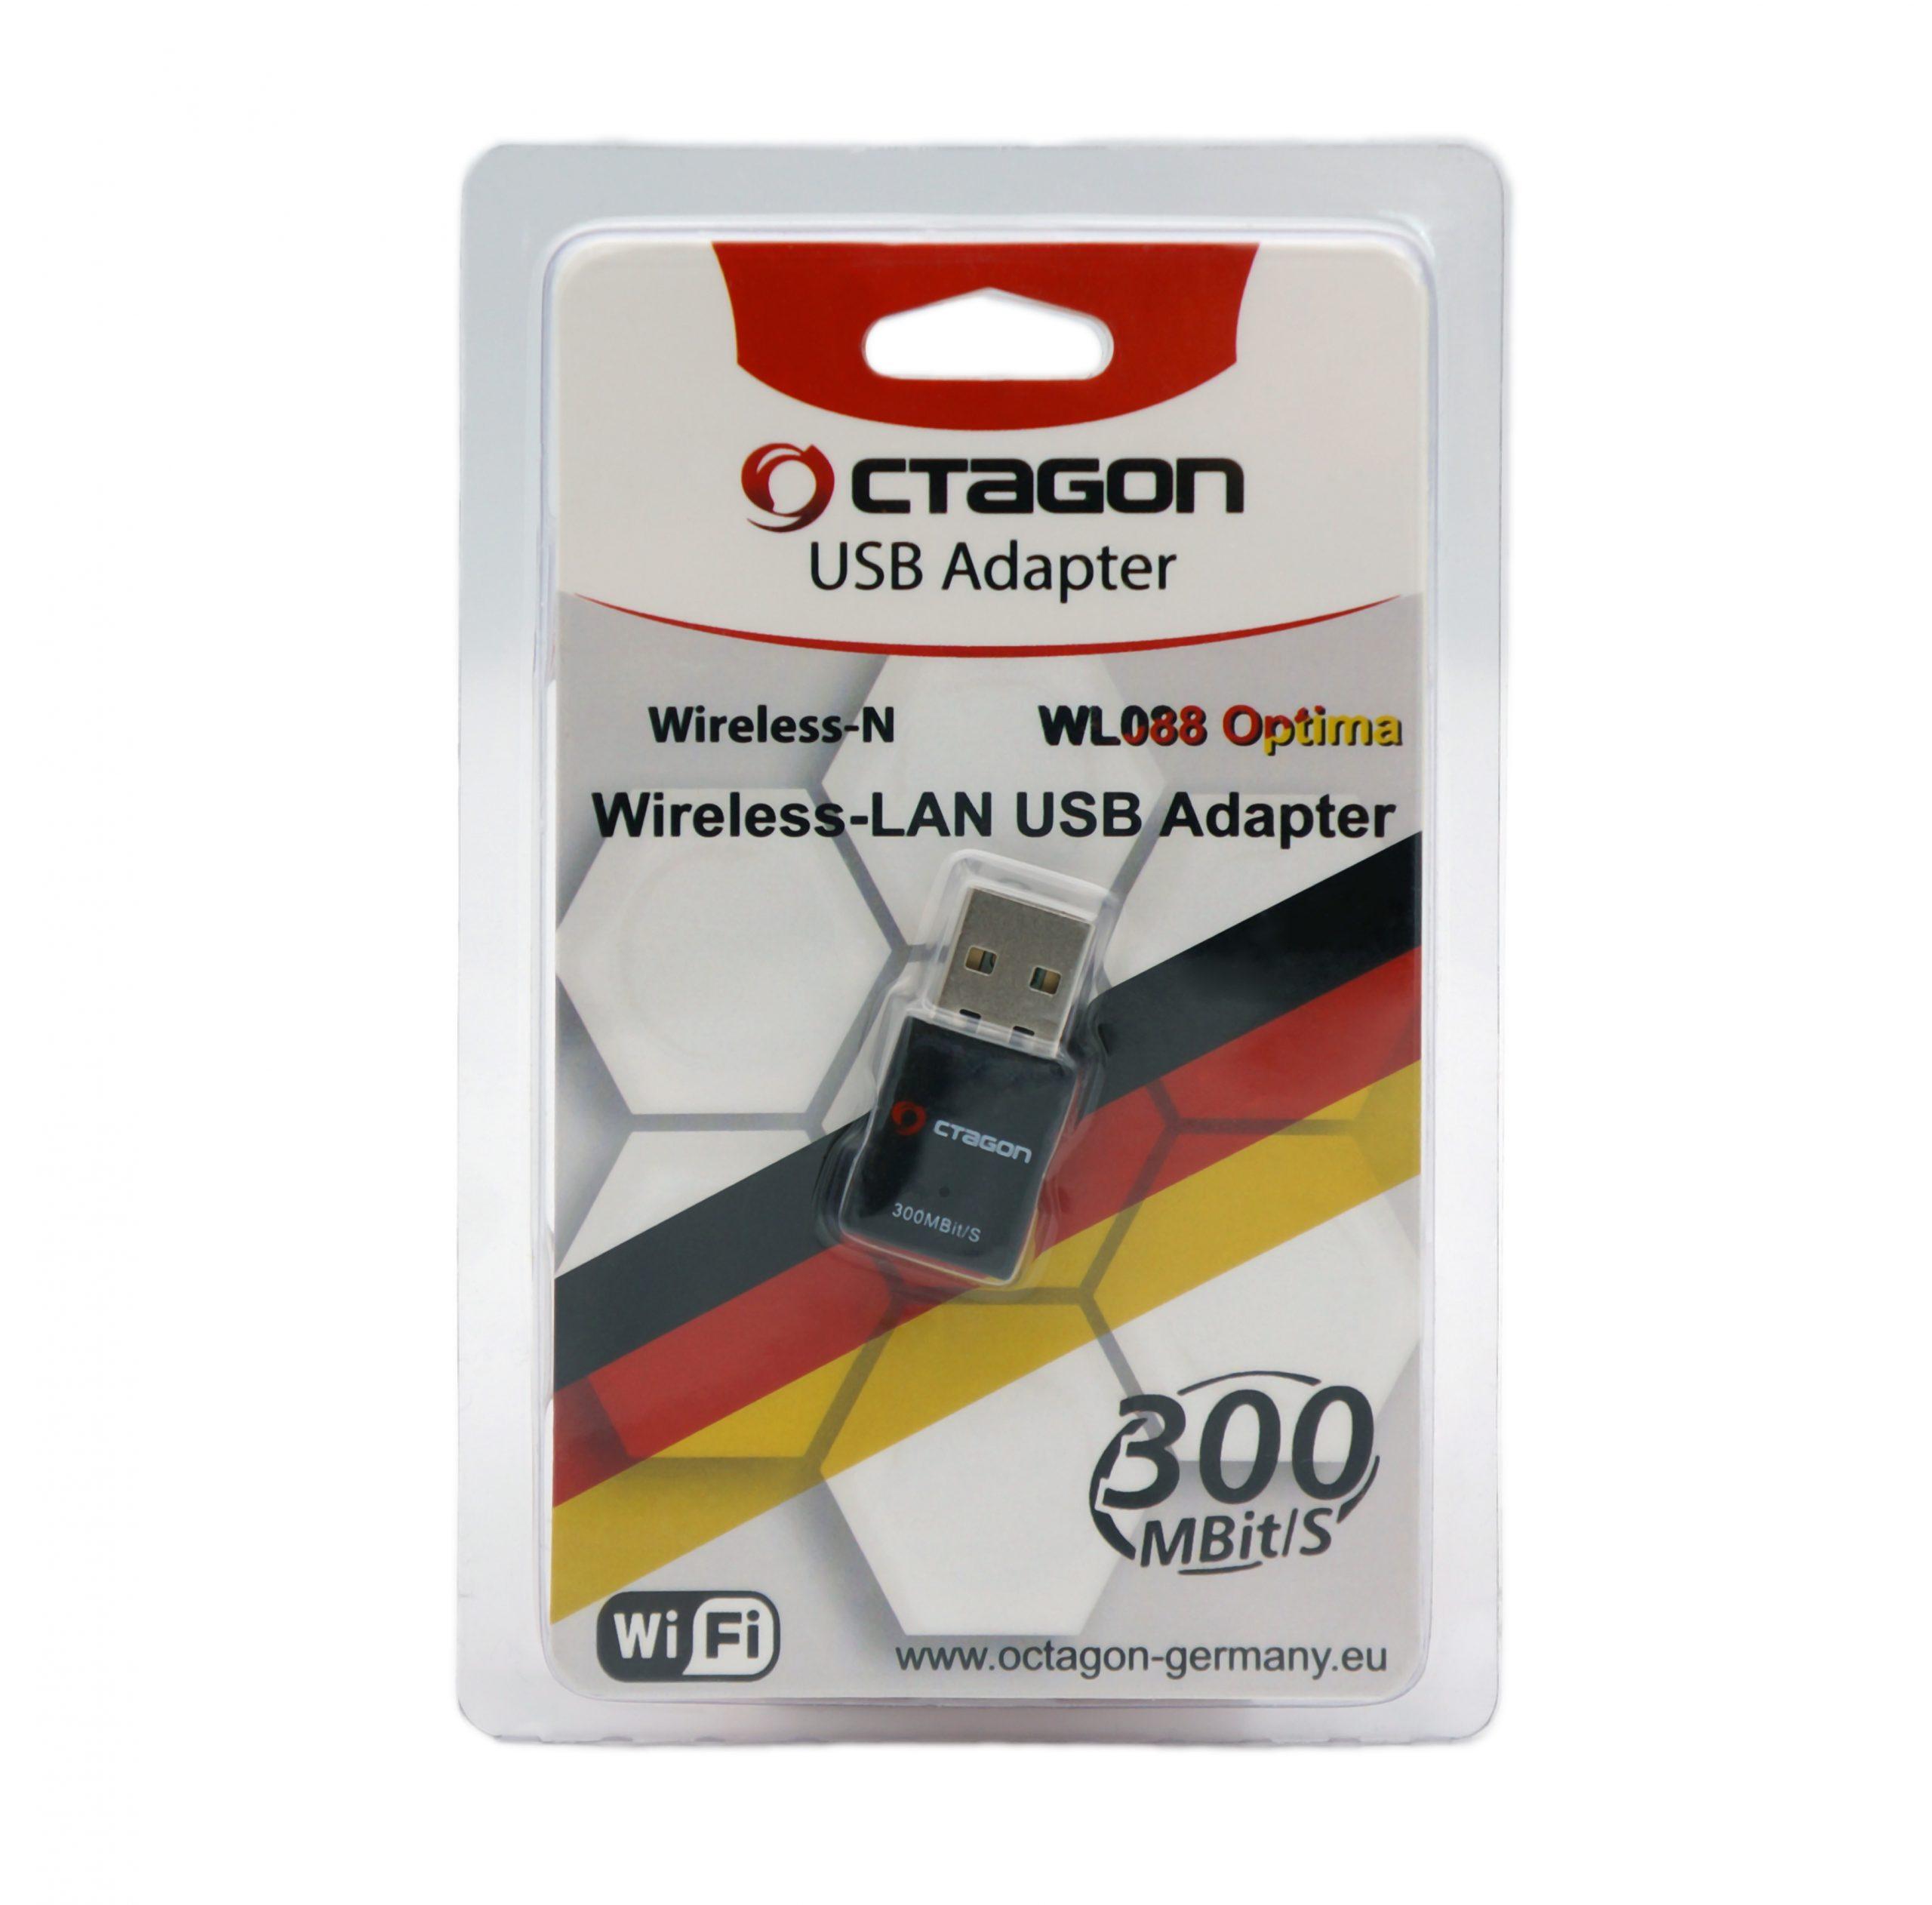 OCTAGON WL088 WLAN 300 Mbit/s USB 2.0 Adapter Blister (WiFi, Wireless)